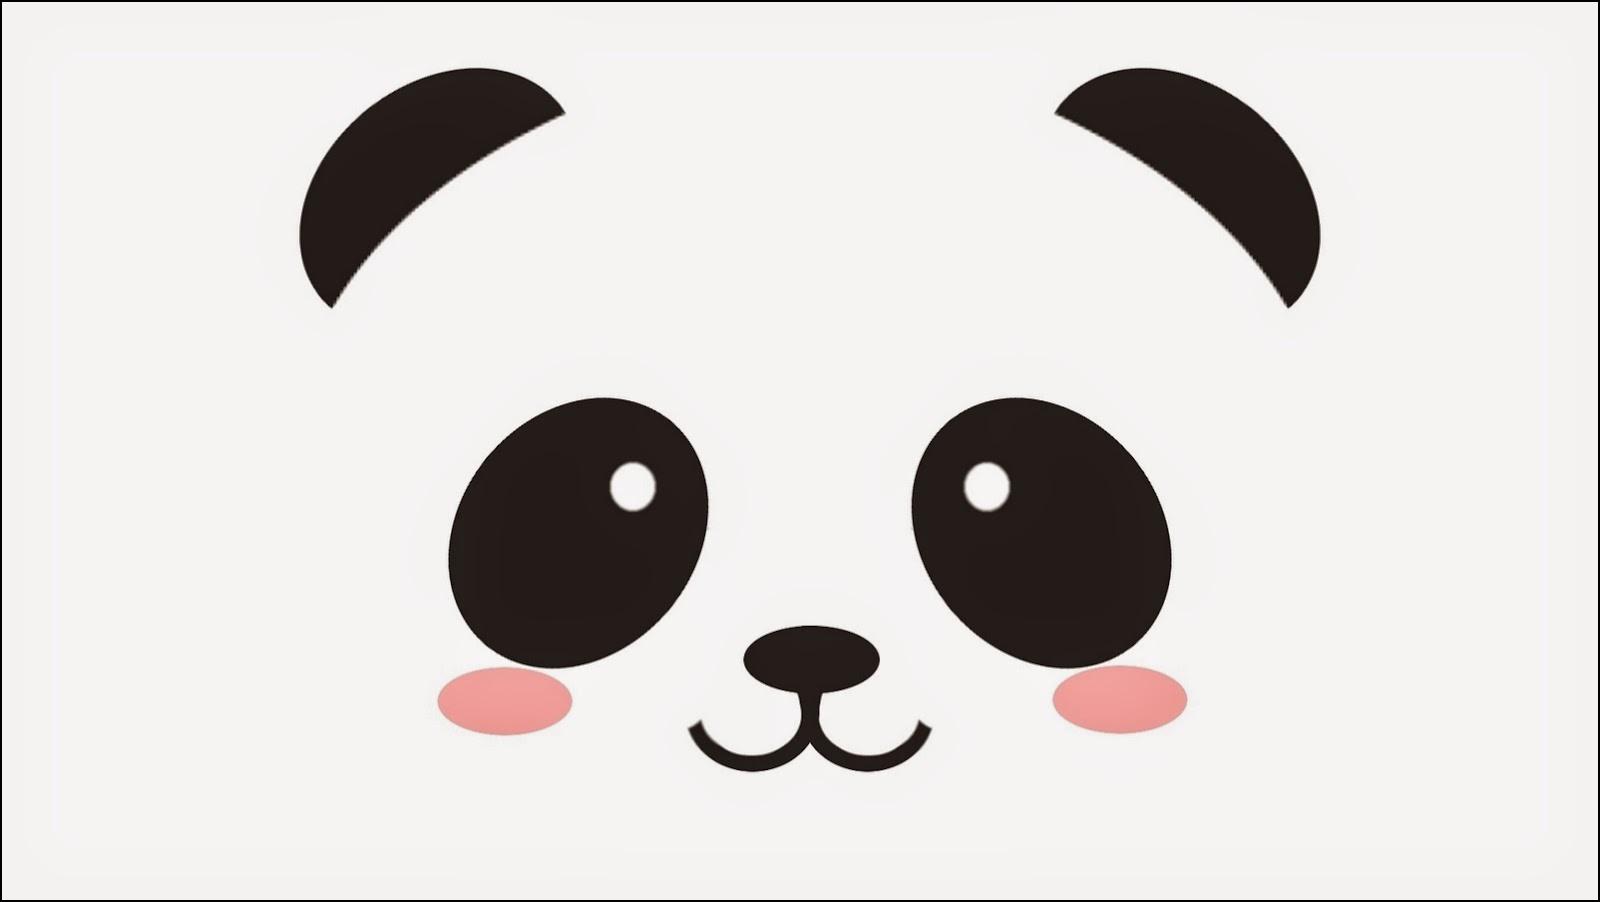 Wallpapers Oso Panda Tiernos